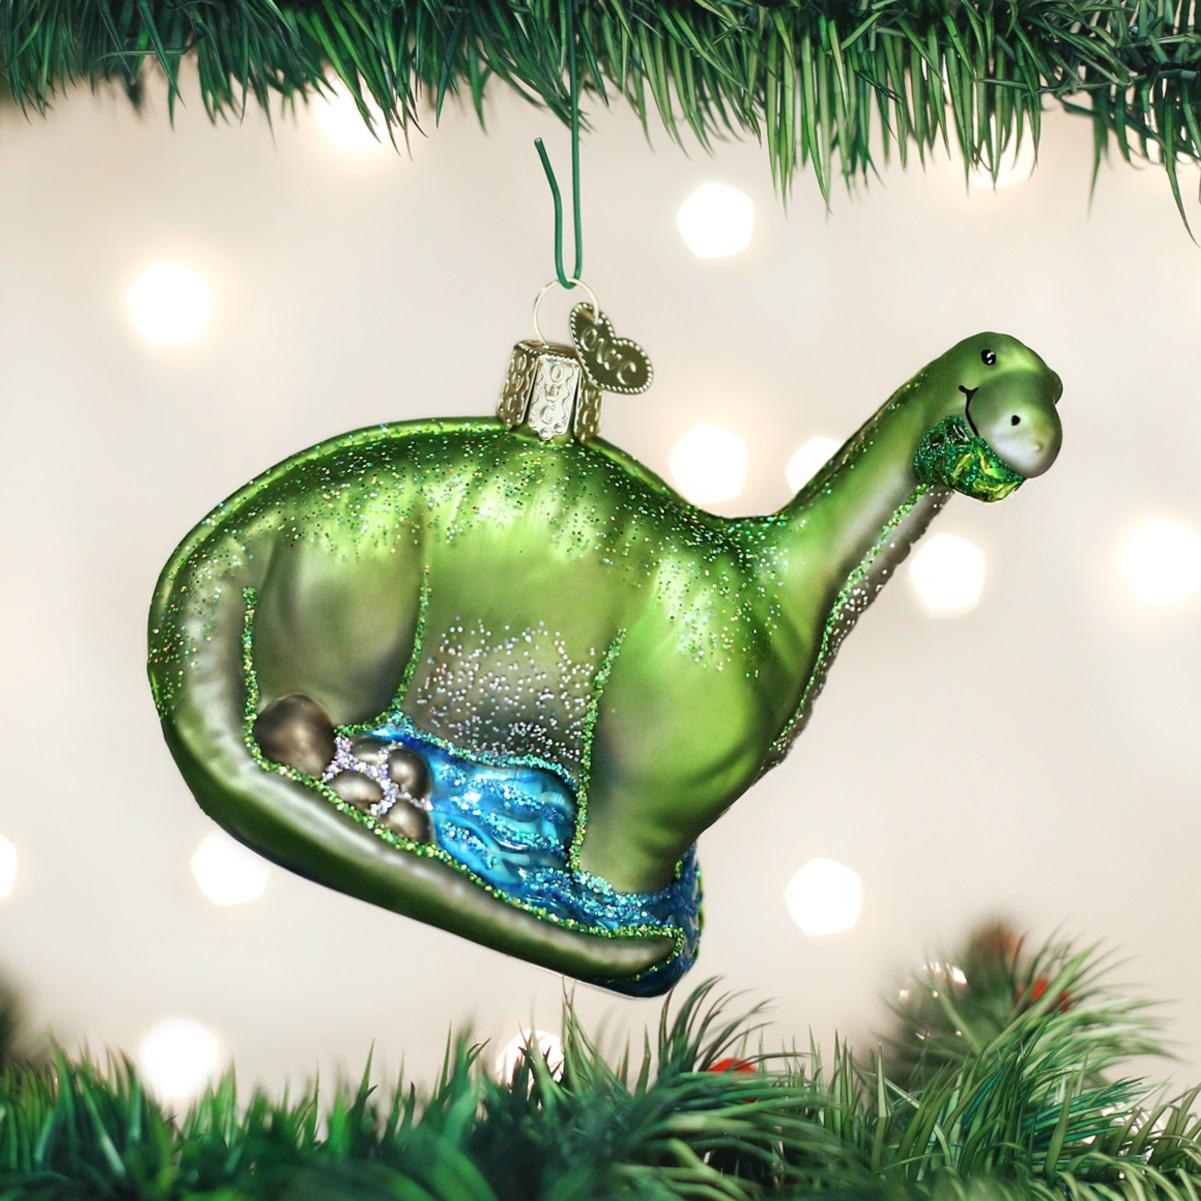 Dinosaur christmas ornaments - Old World Christmas Brontosaurus Dinosaur Glass Tree Ornament 12471 Free Box New